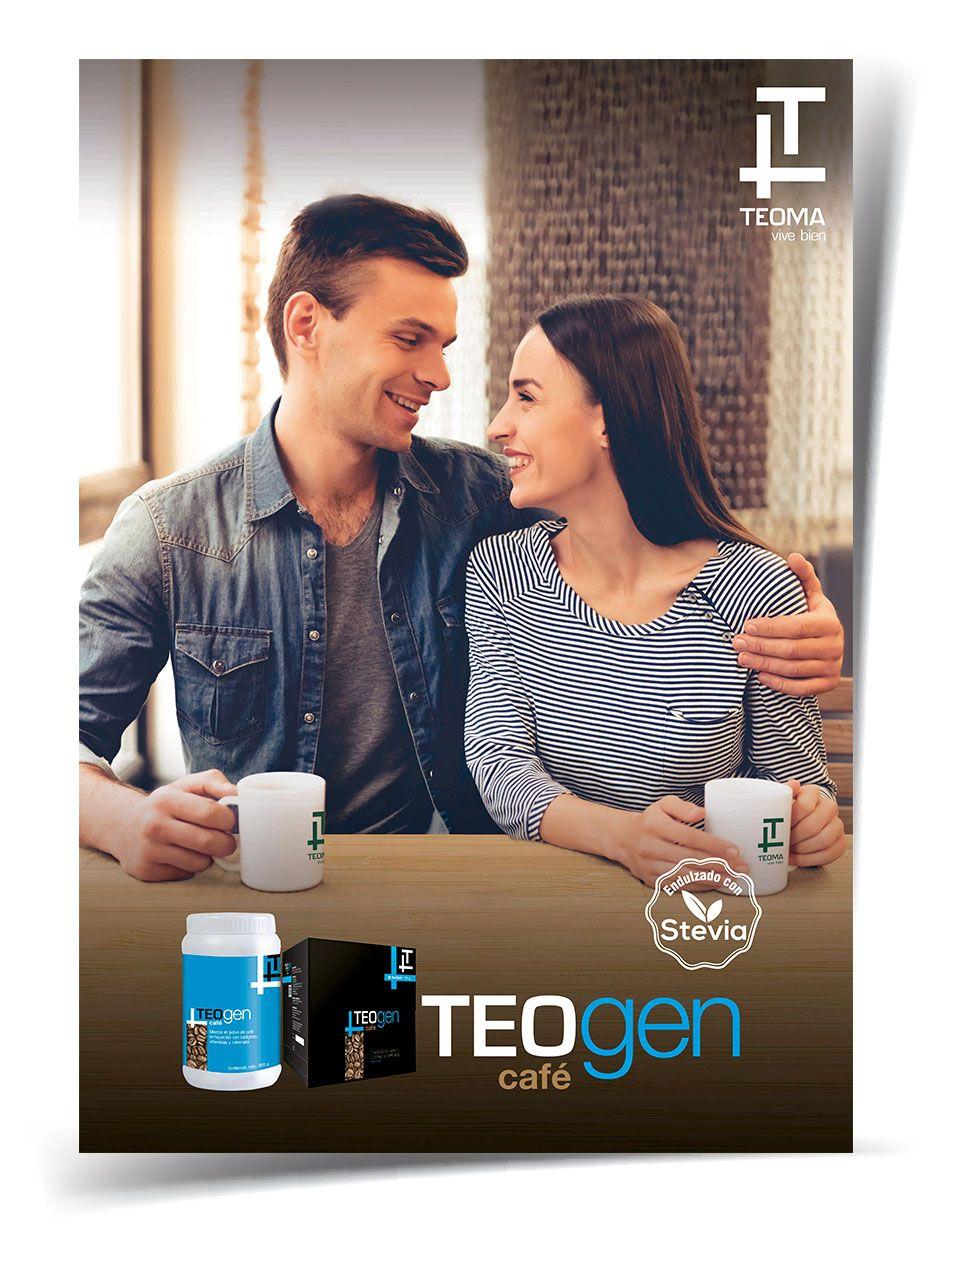 teogen Cafe teoma